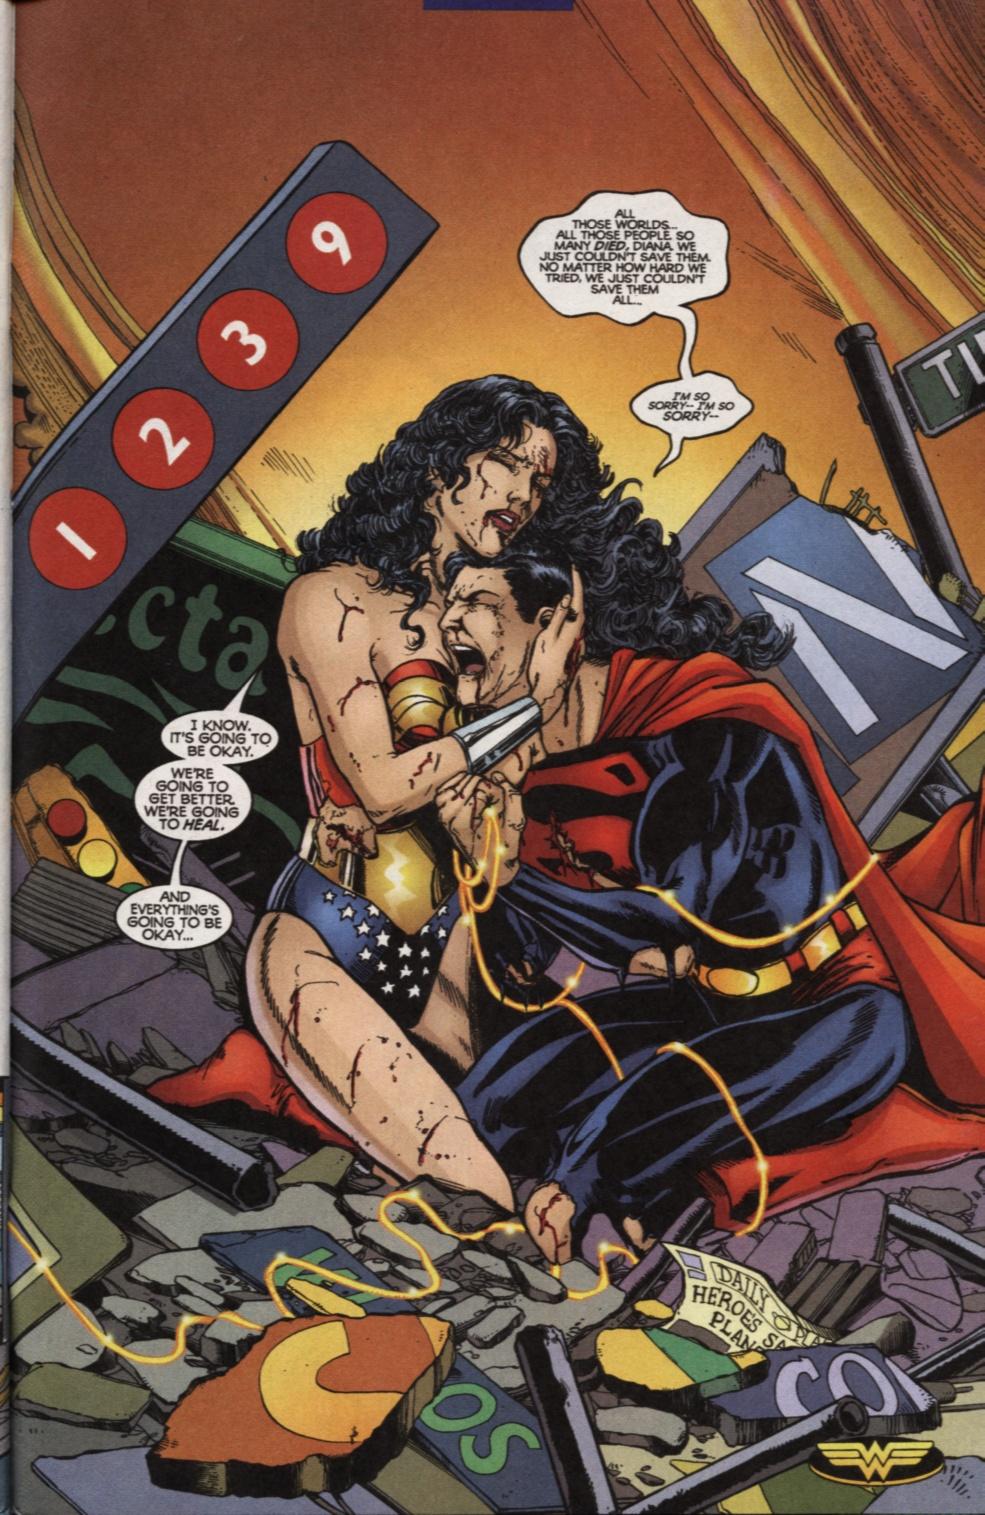 wonder woman_175_37_Csodano_Superman.jpg